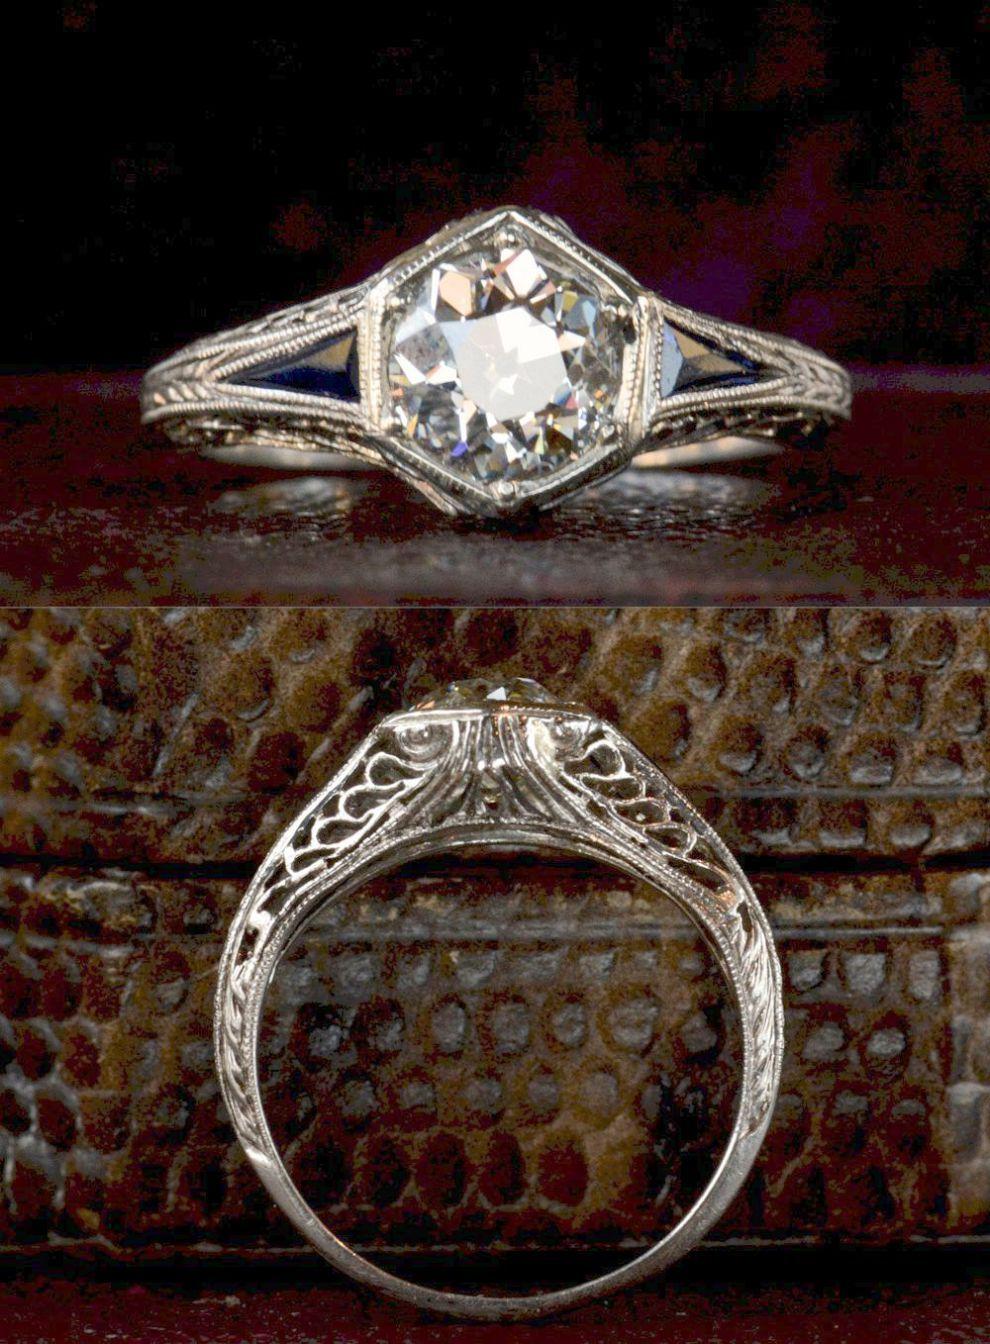 Jewellery Shops Sunderland Jewellery Box Gift Plus Jewellery Online India Vintage Engagement Rings Unique Round Diamond Engagement Rings Fine Diamond Jewelry